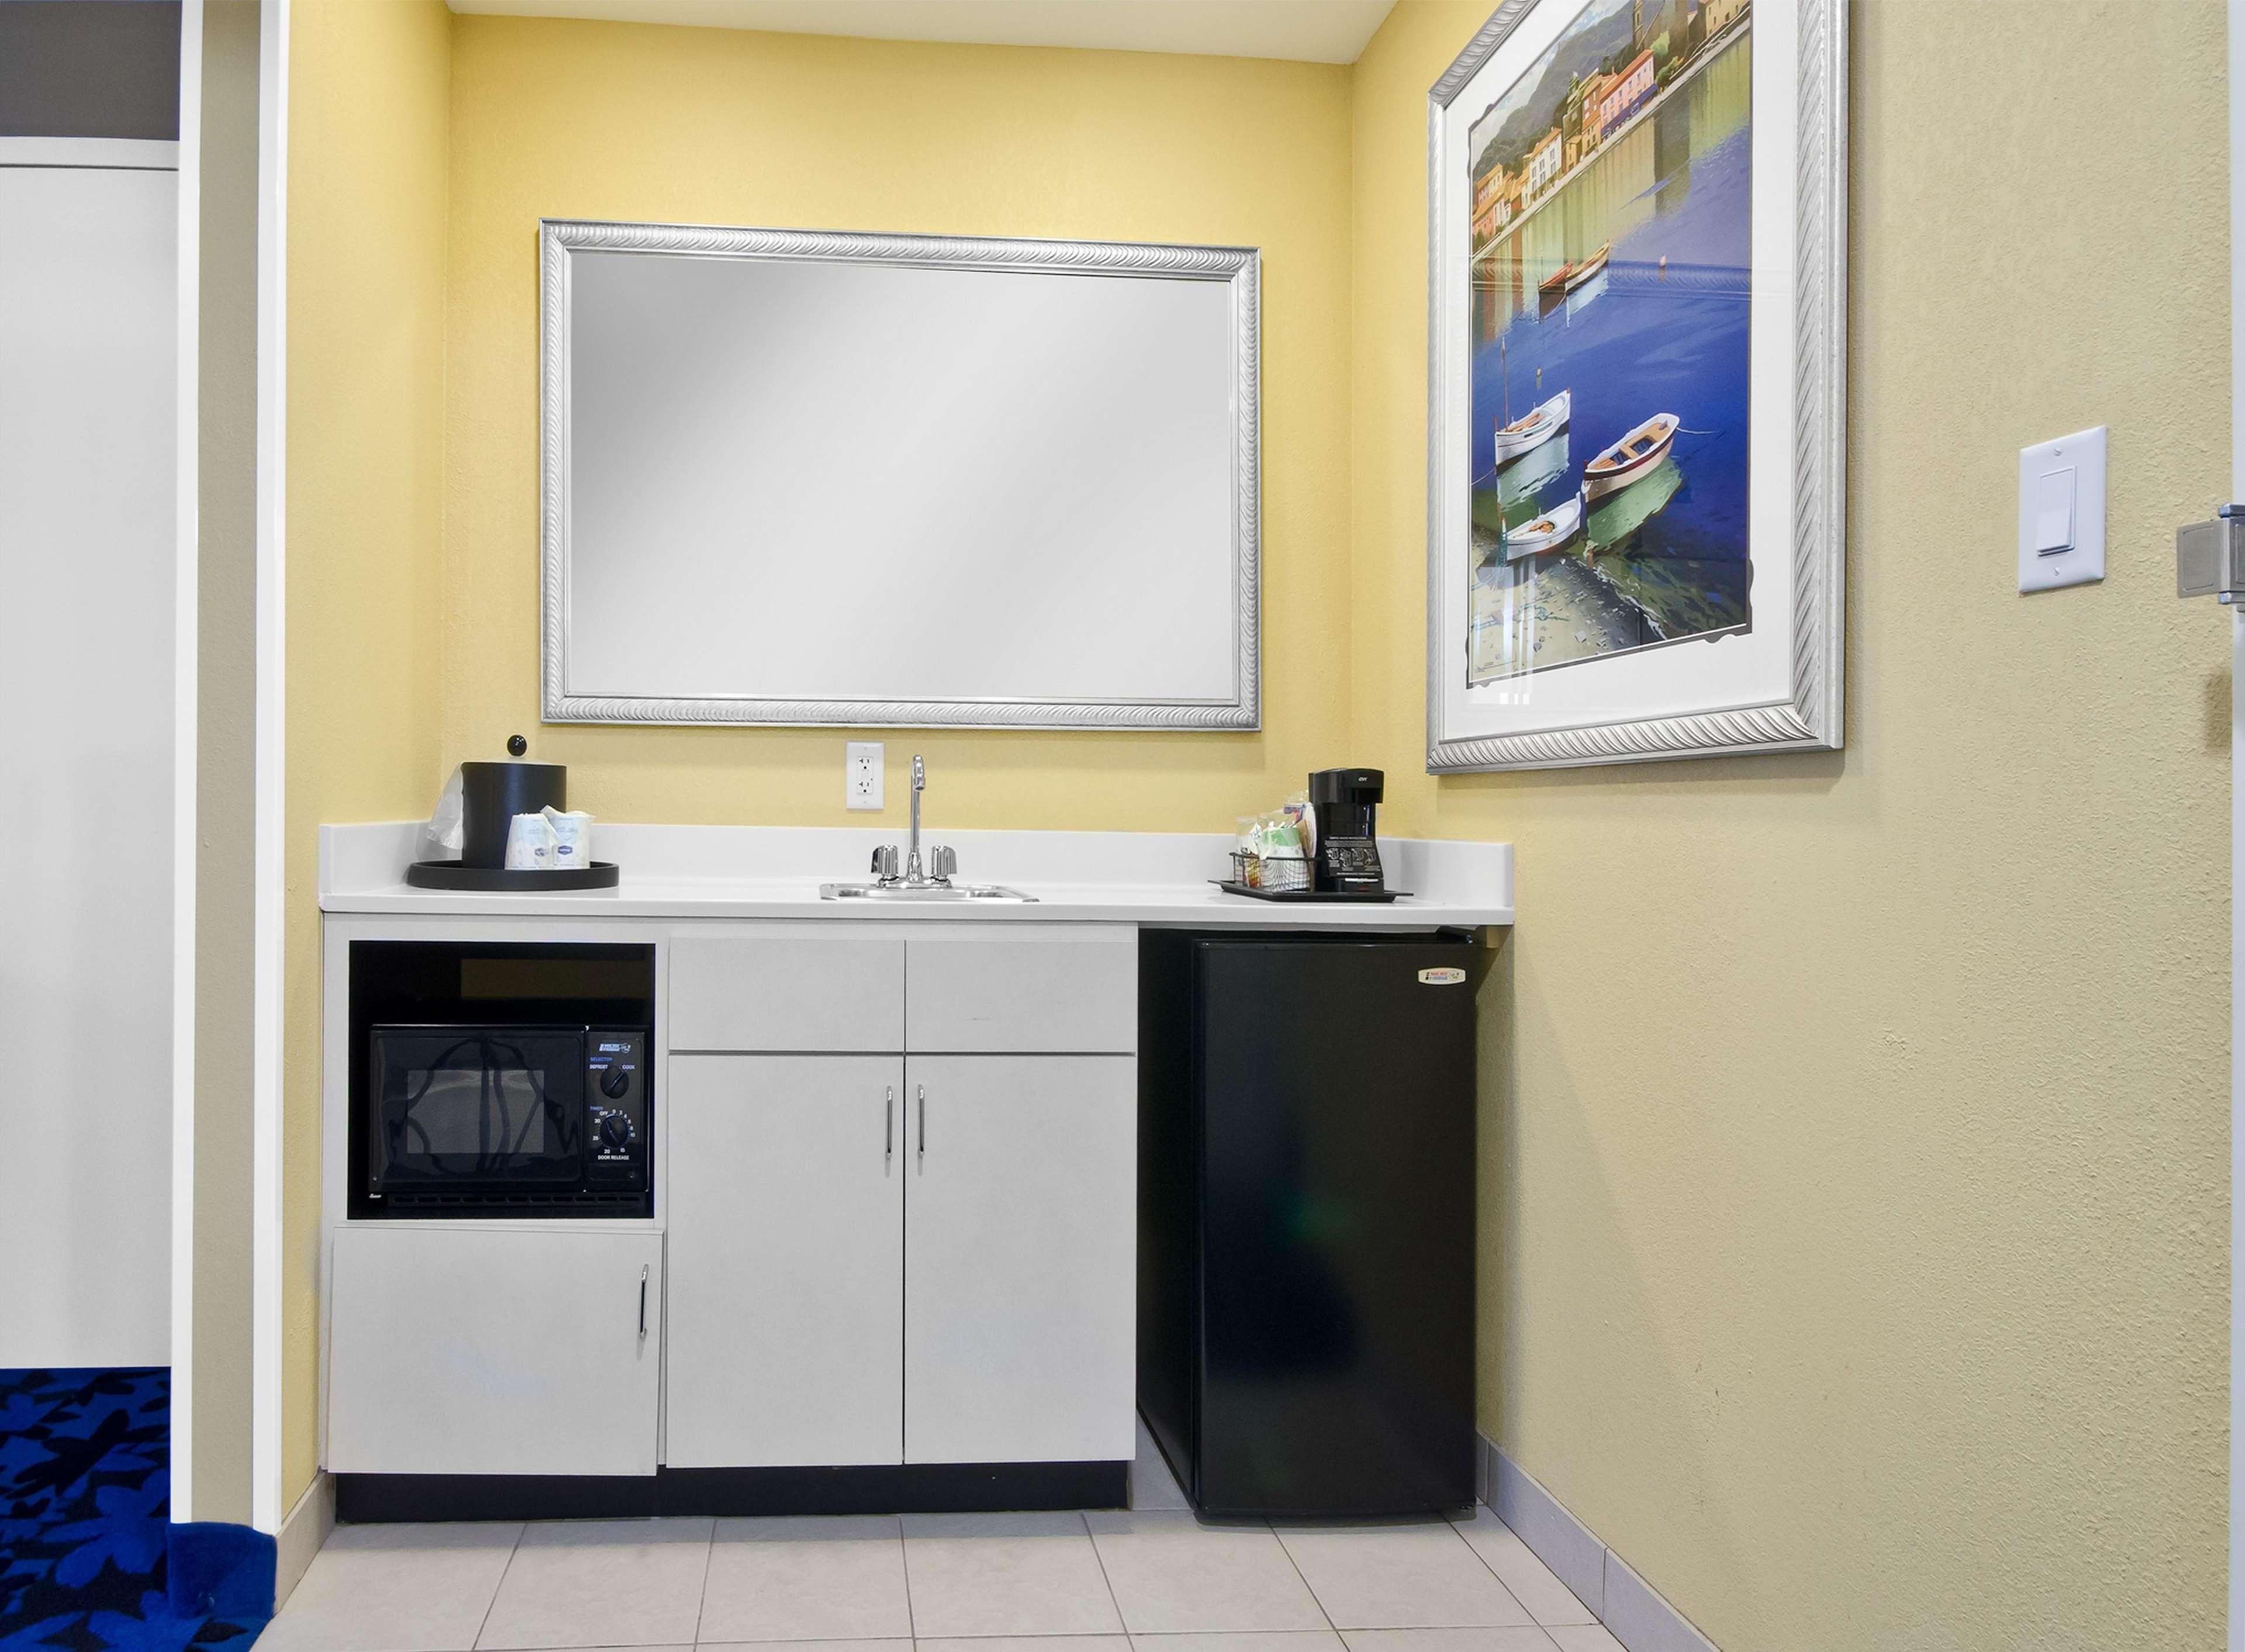 Hampton Inn & Suites Jacksonville South-St. Johns Town Center Area image 31